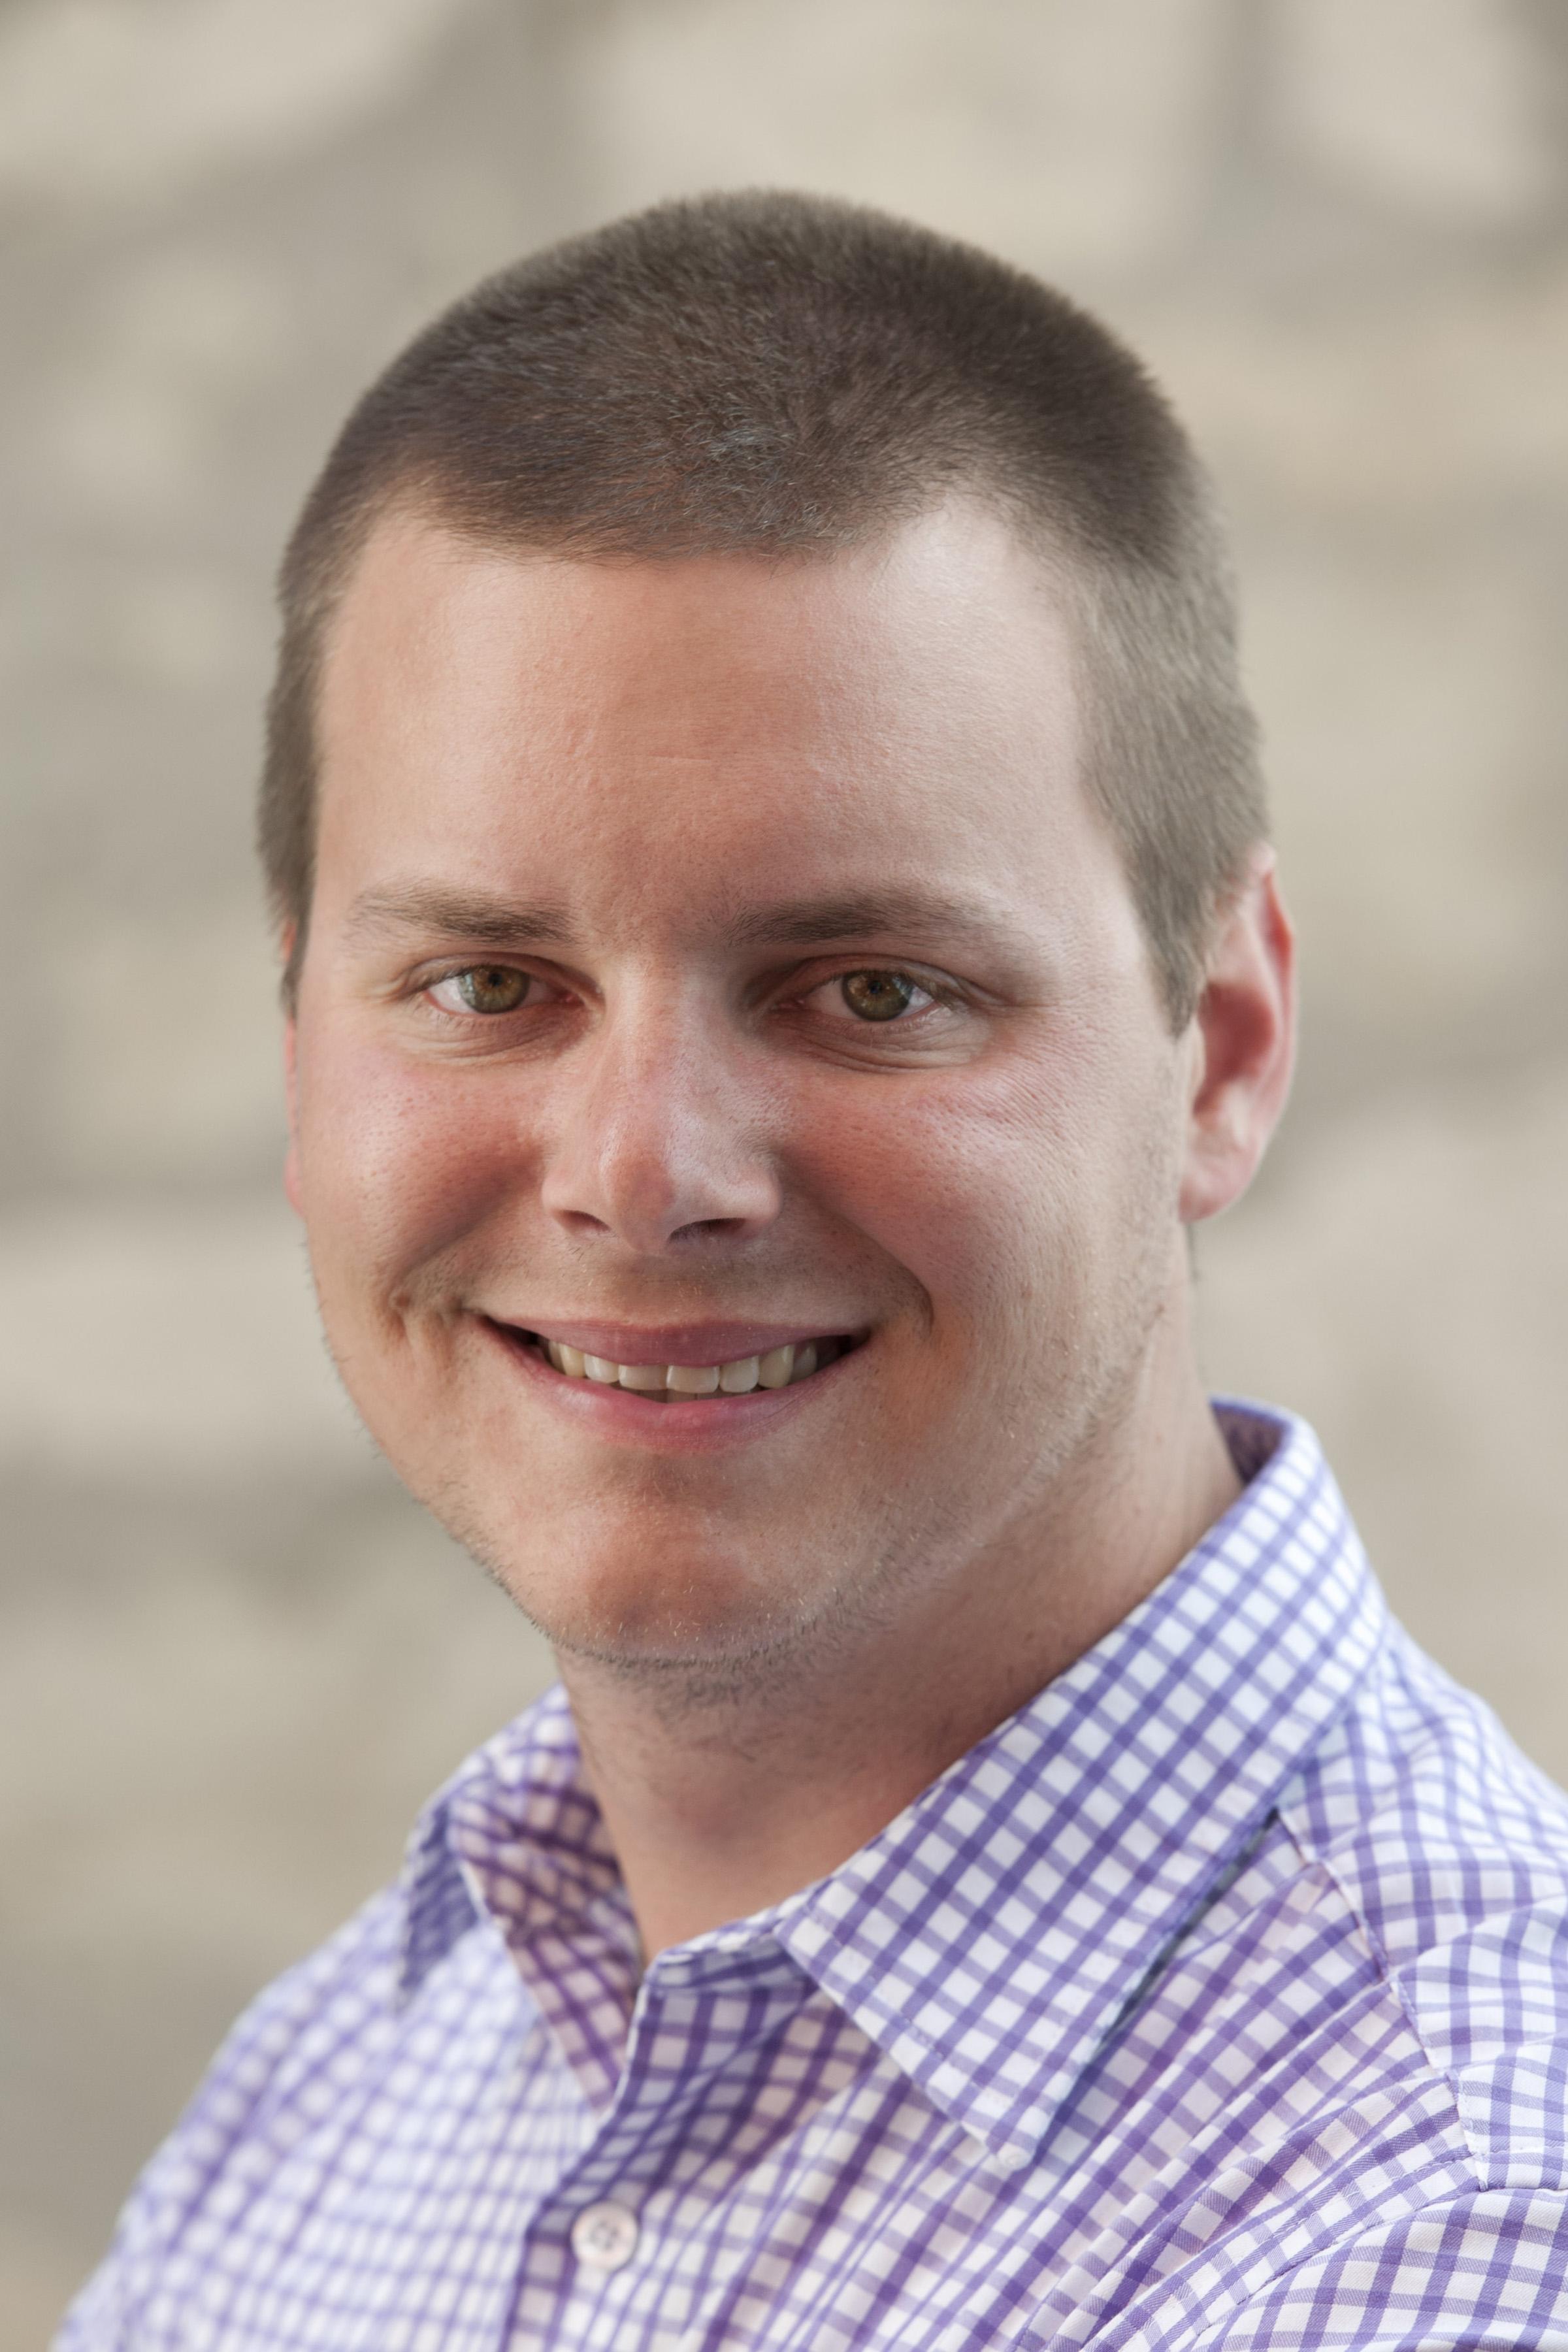 Jason Dykstra